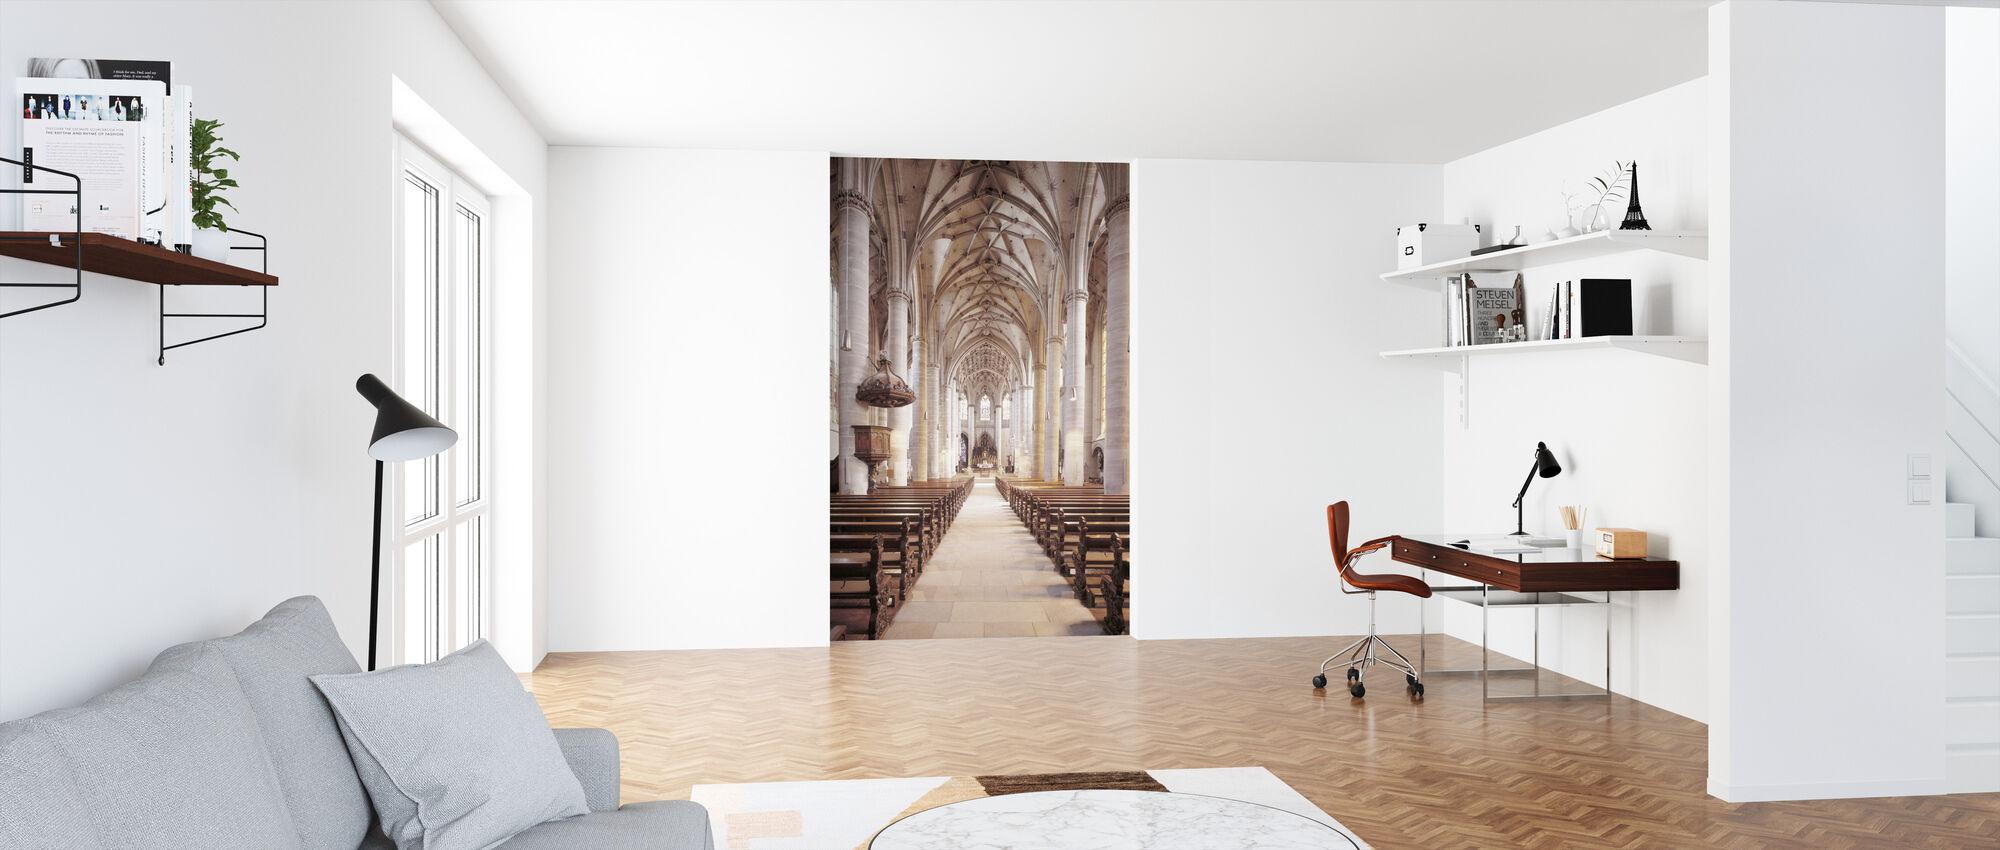 Gmuender Münster - Wallpaper - Office